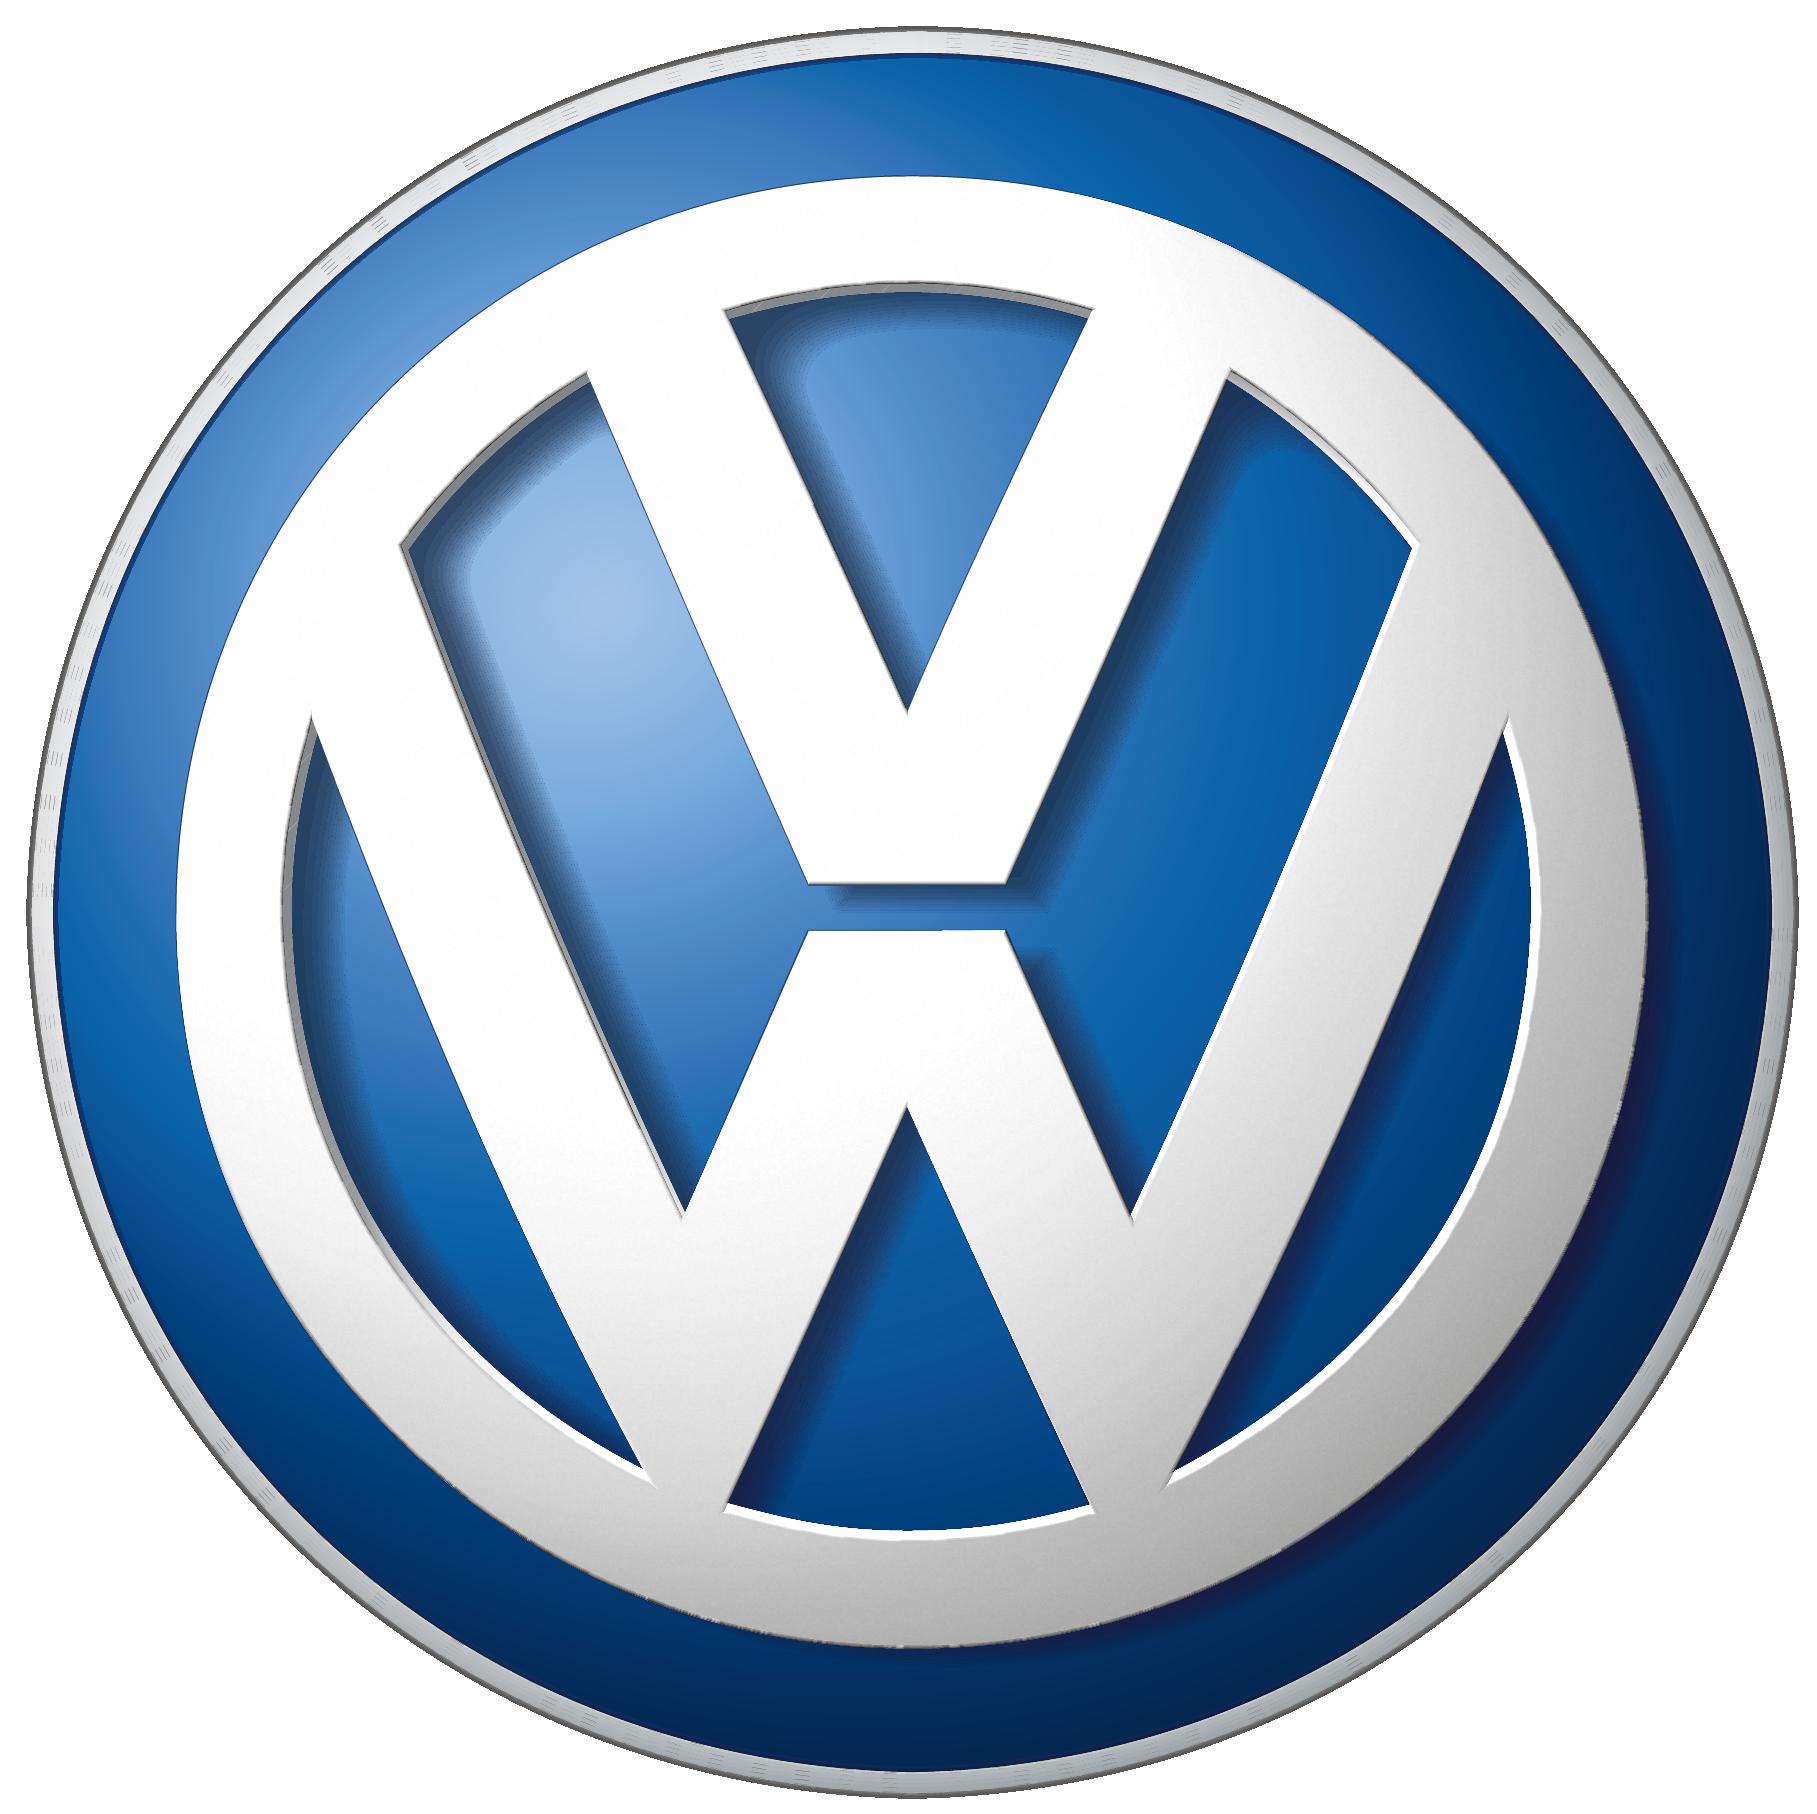 ricambi-volkswagen-trieste-autodemolizioni-casale